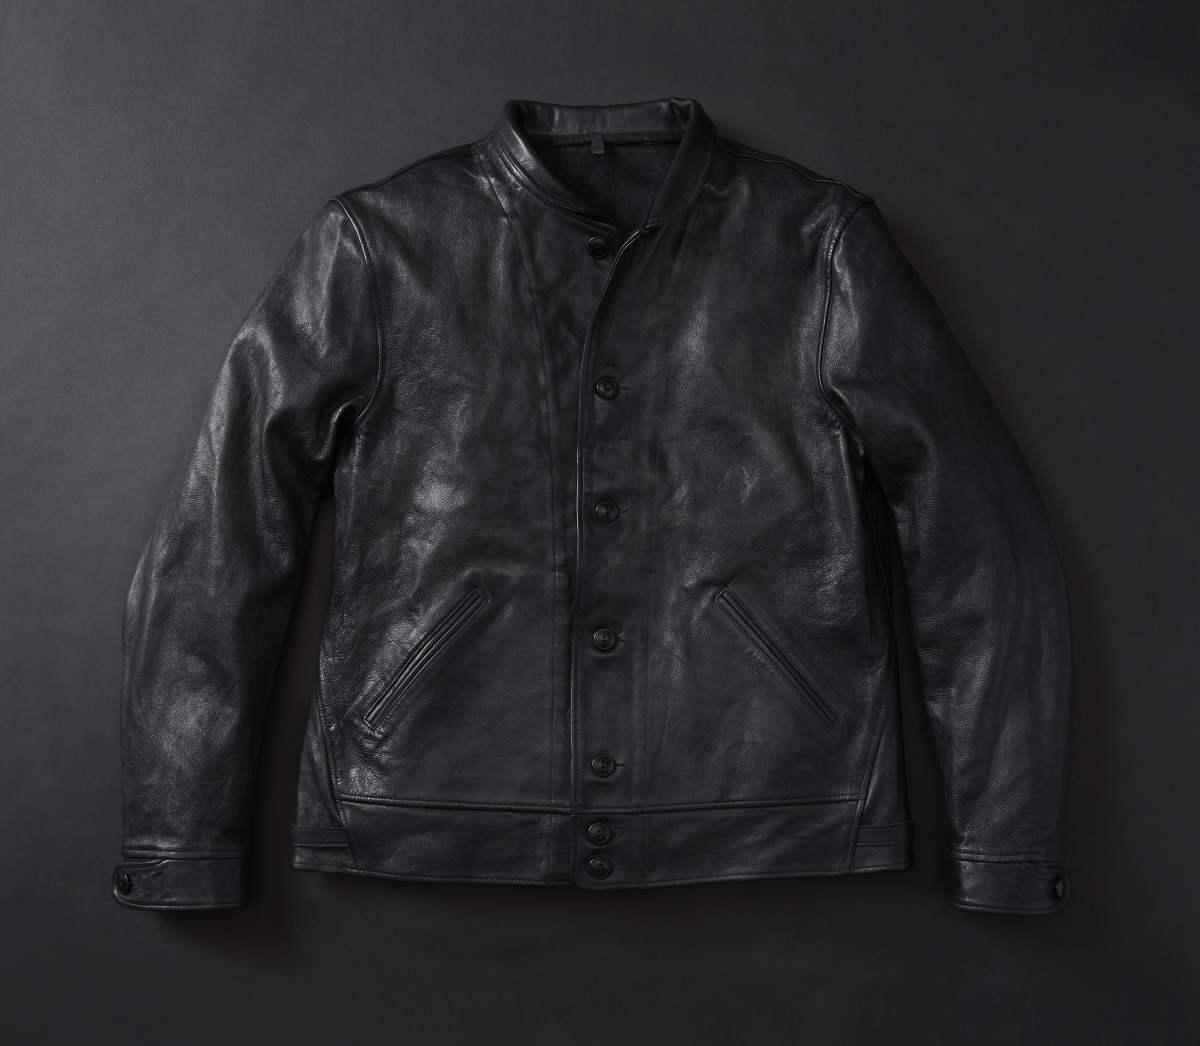 Levi's Menlo Cossack Jacket